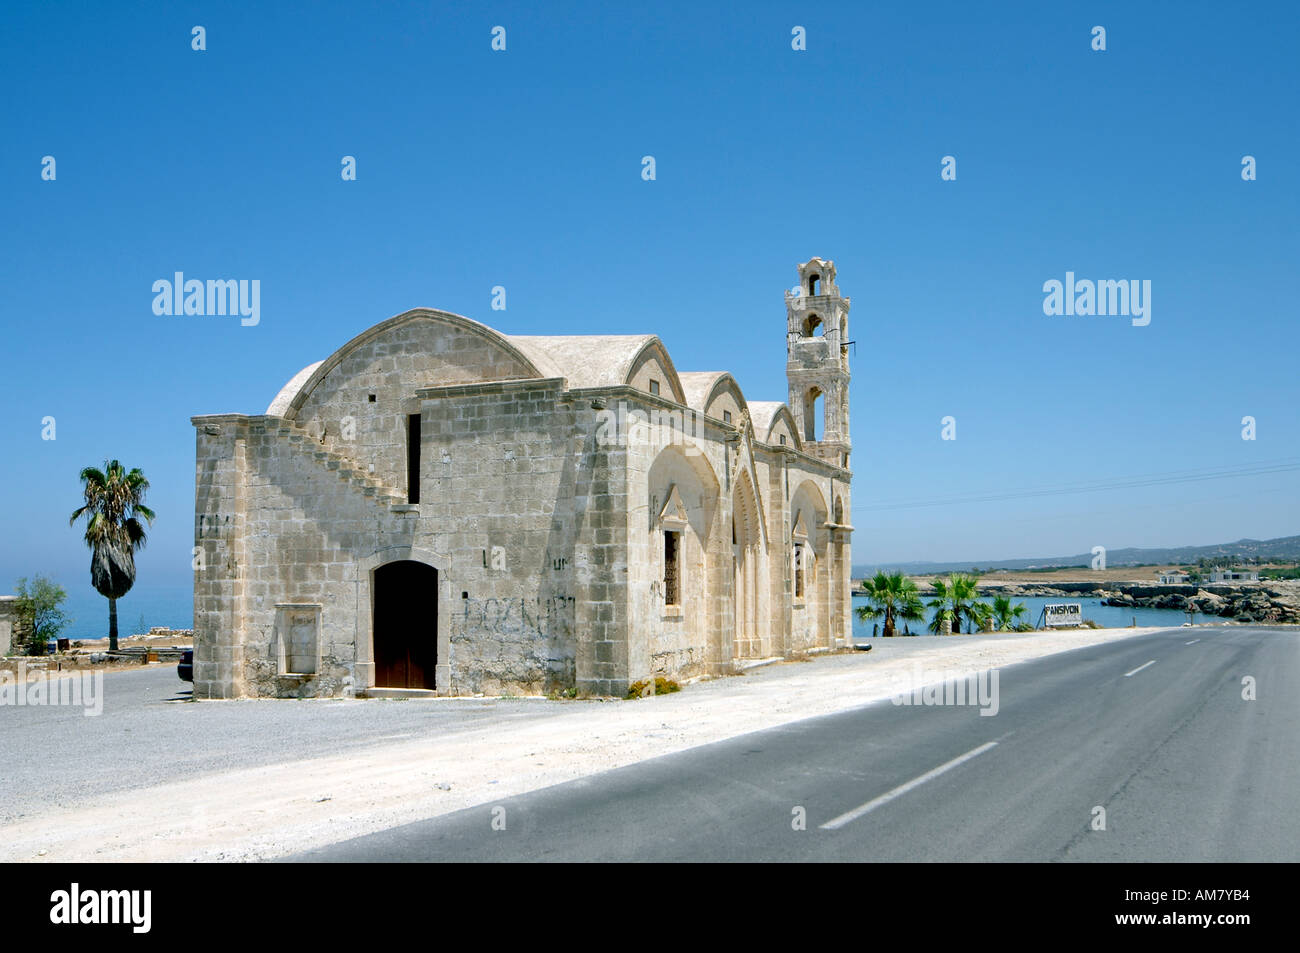 Agios Thyrsos Greek Orthodox Church Karpas Peninsula Northern Cyprus Stock Photo